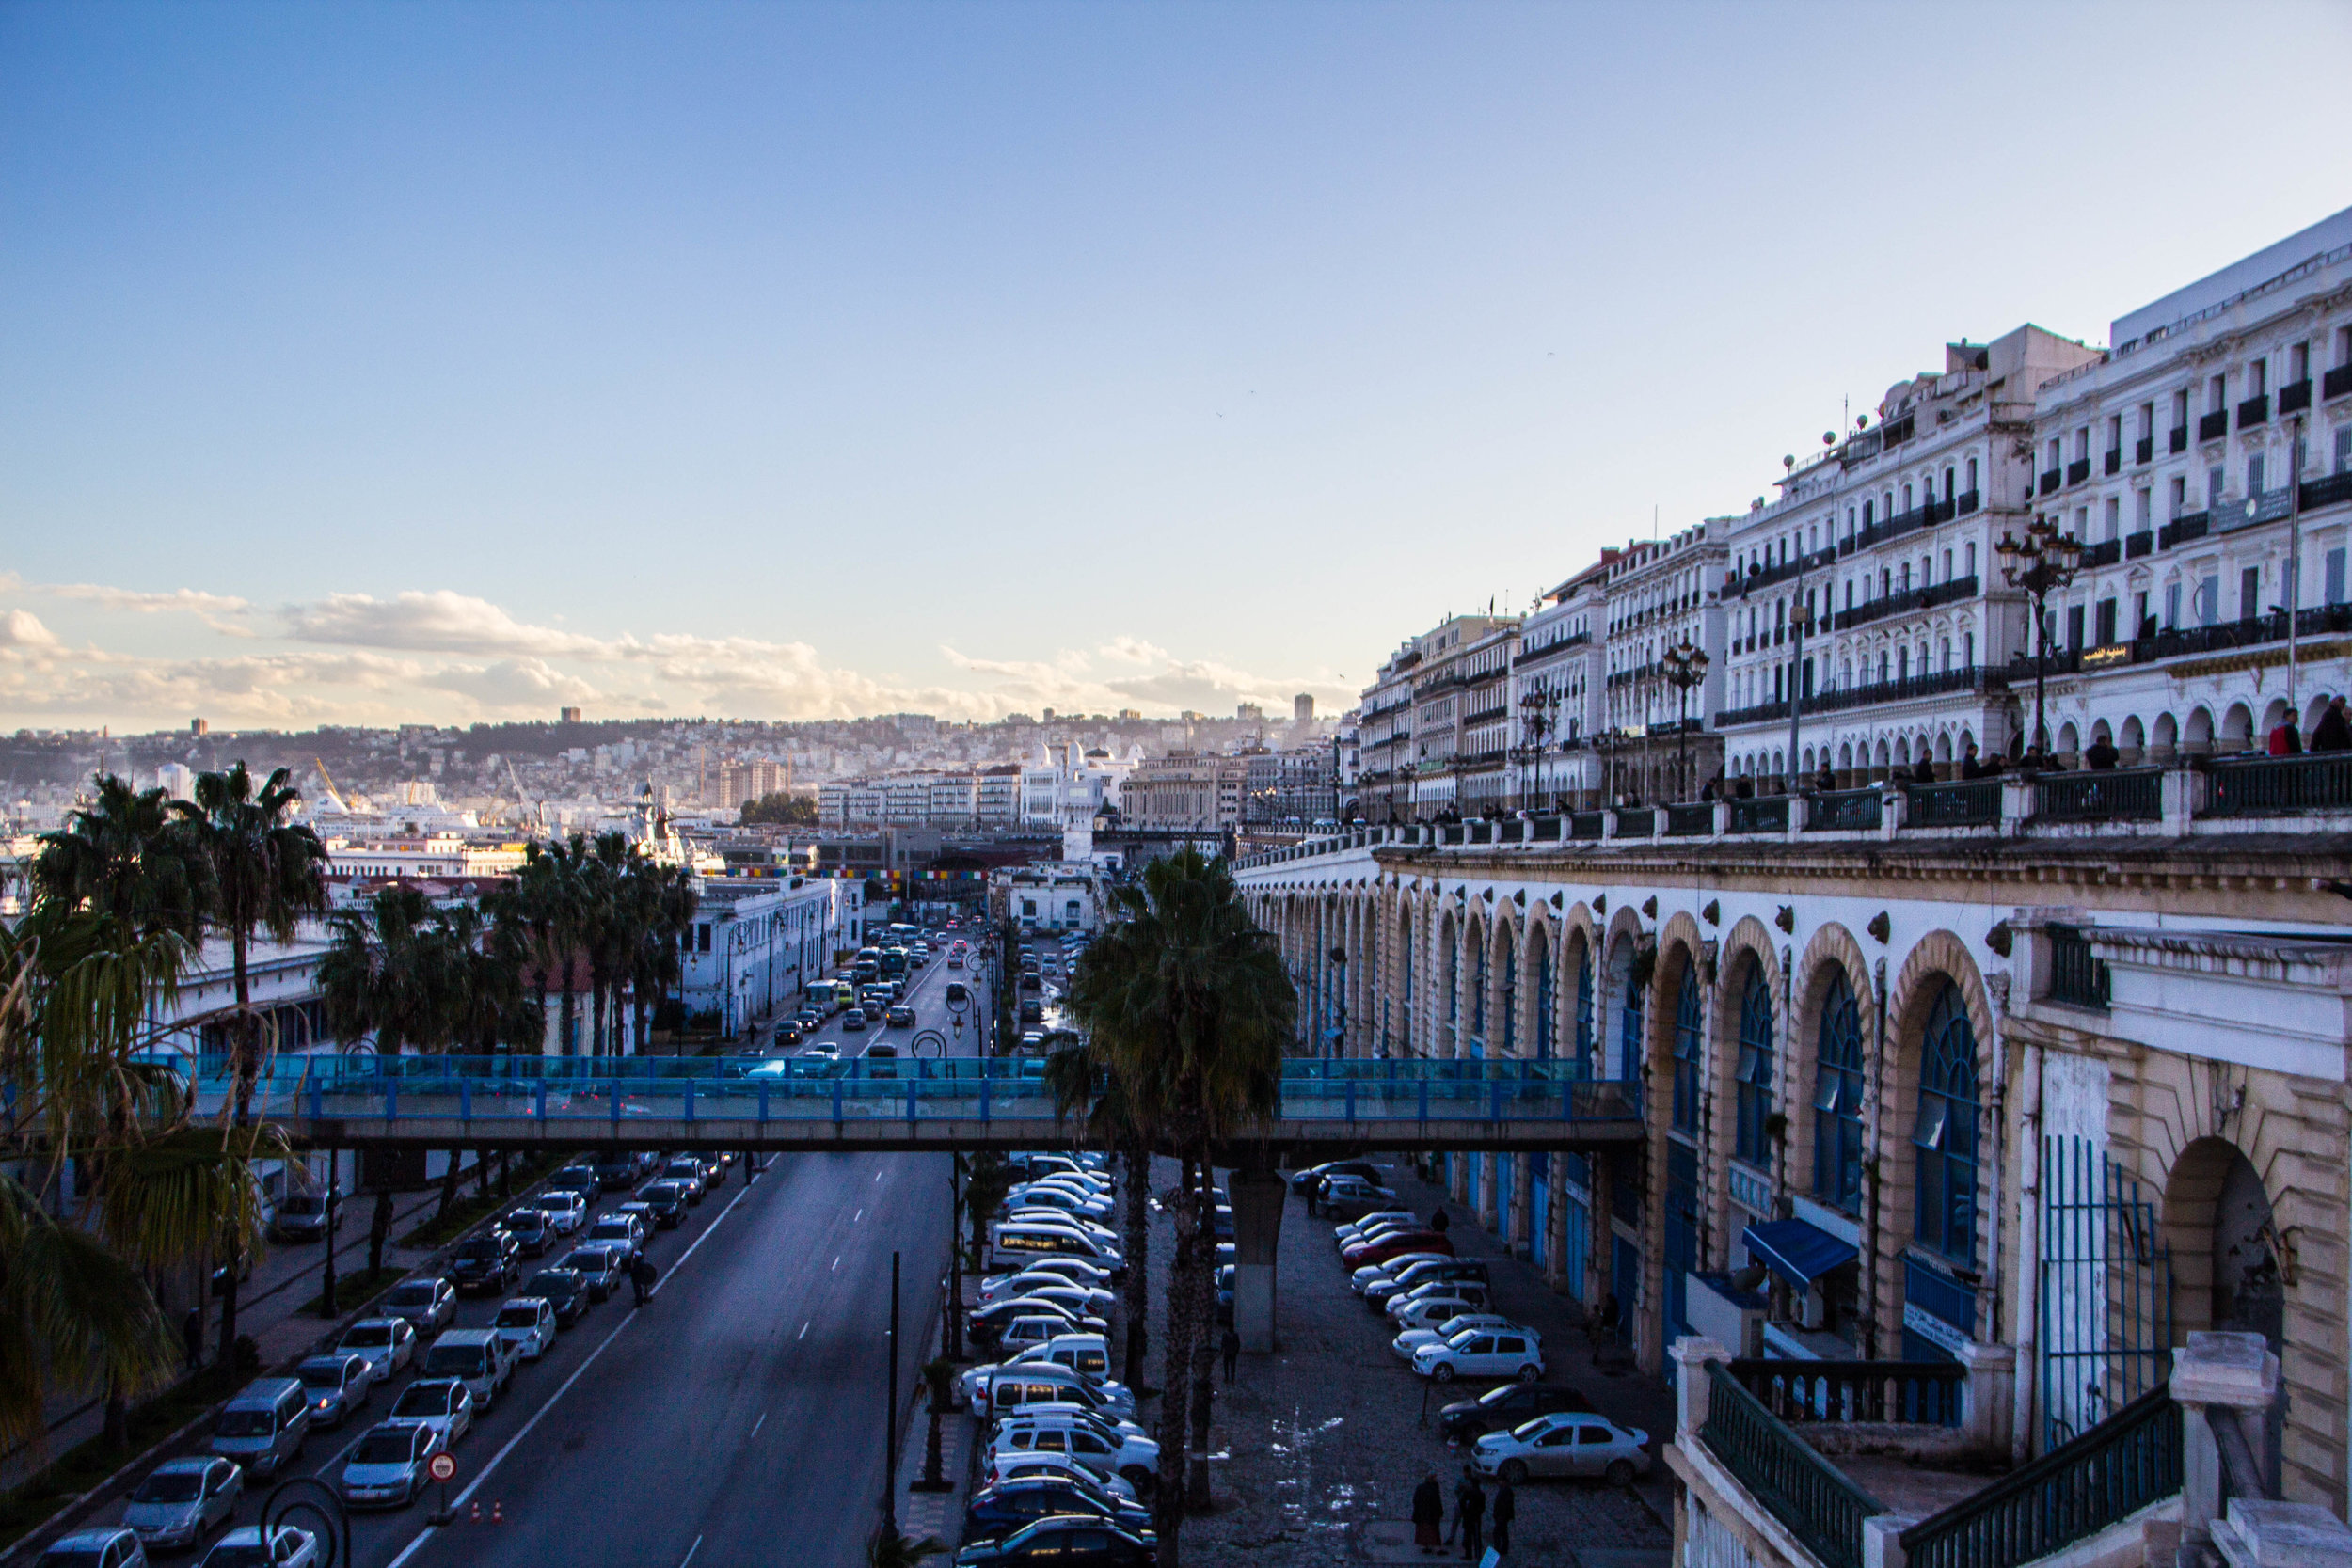 streets-algiers-algeria-40.jpg